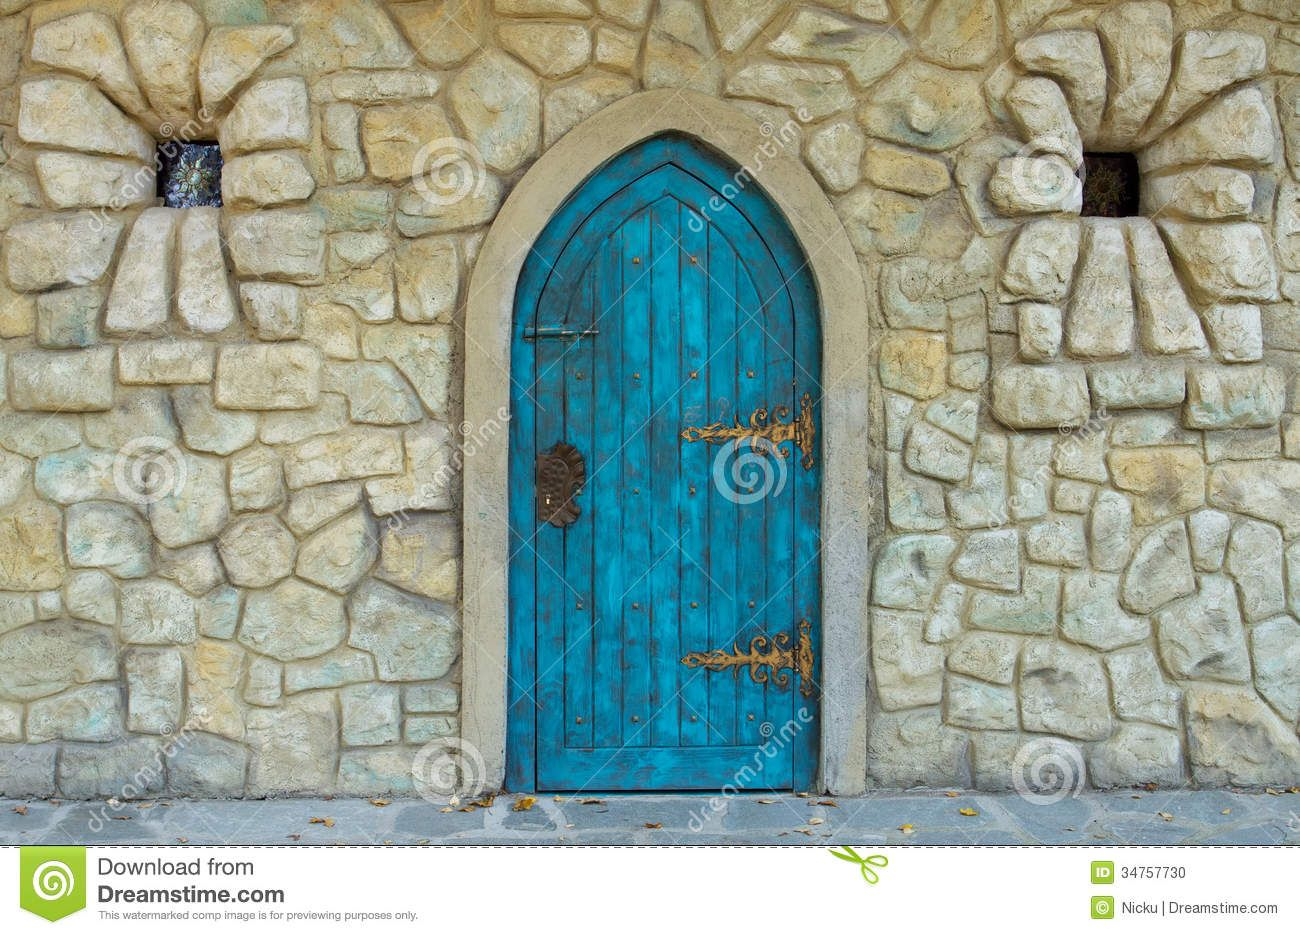 Old Castle Door Stock Photo - Image 34757730 & Old Castle Door Stock Photo - Image: 34757730   Doors   Pinterest ...